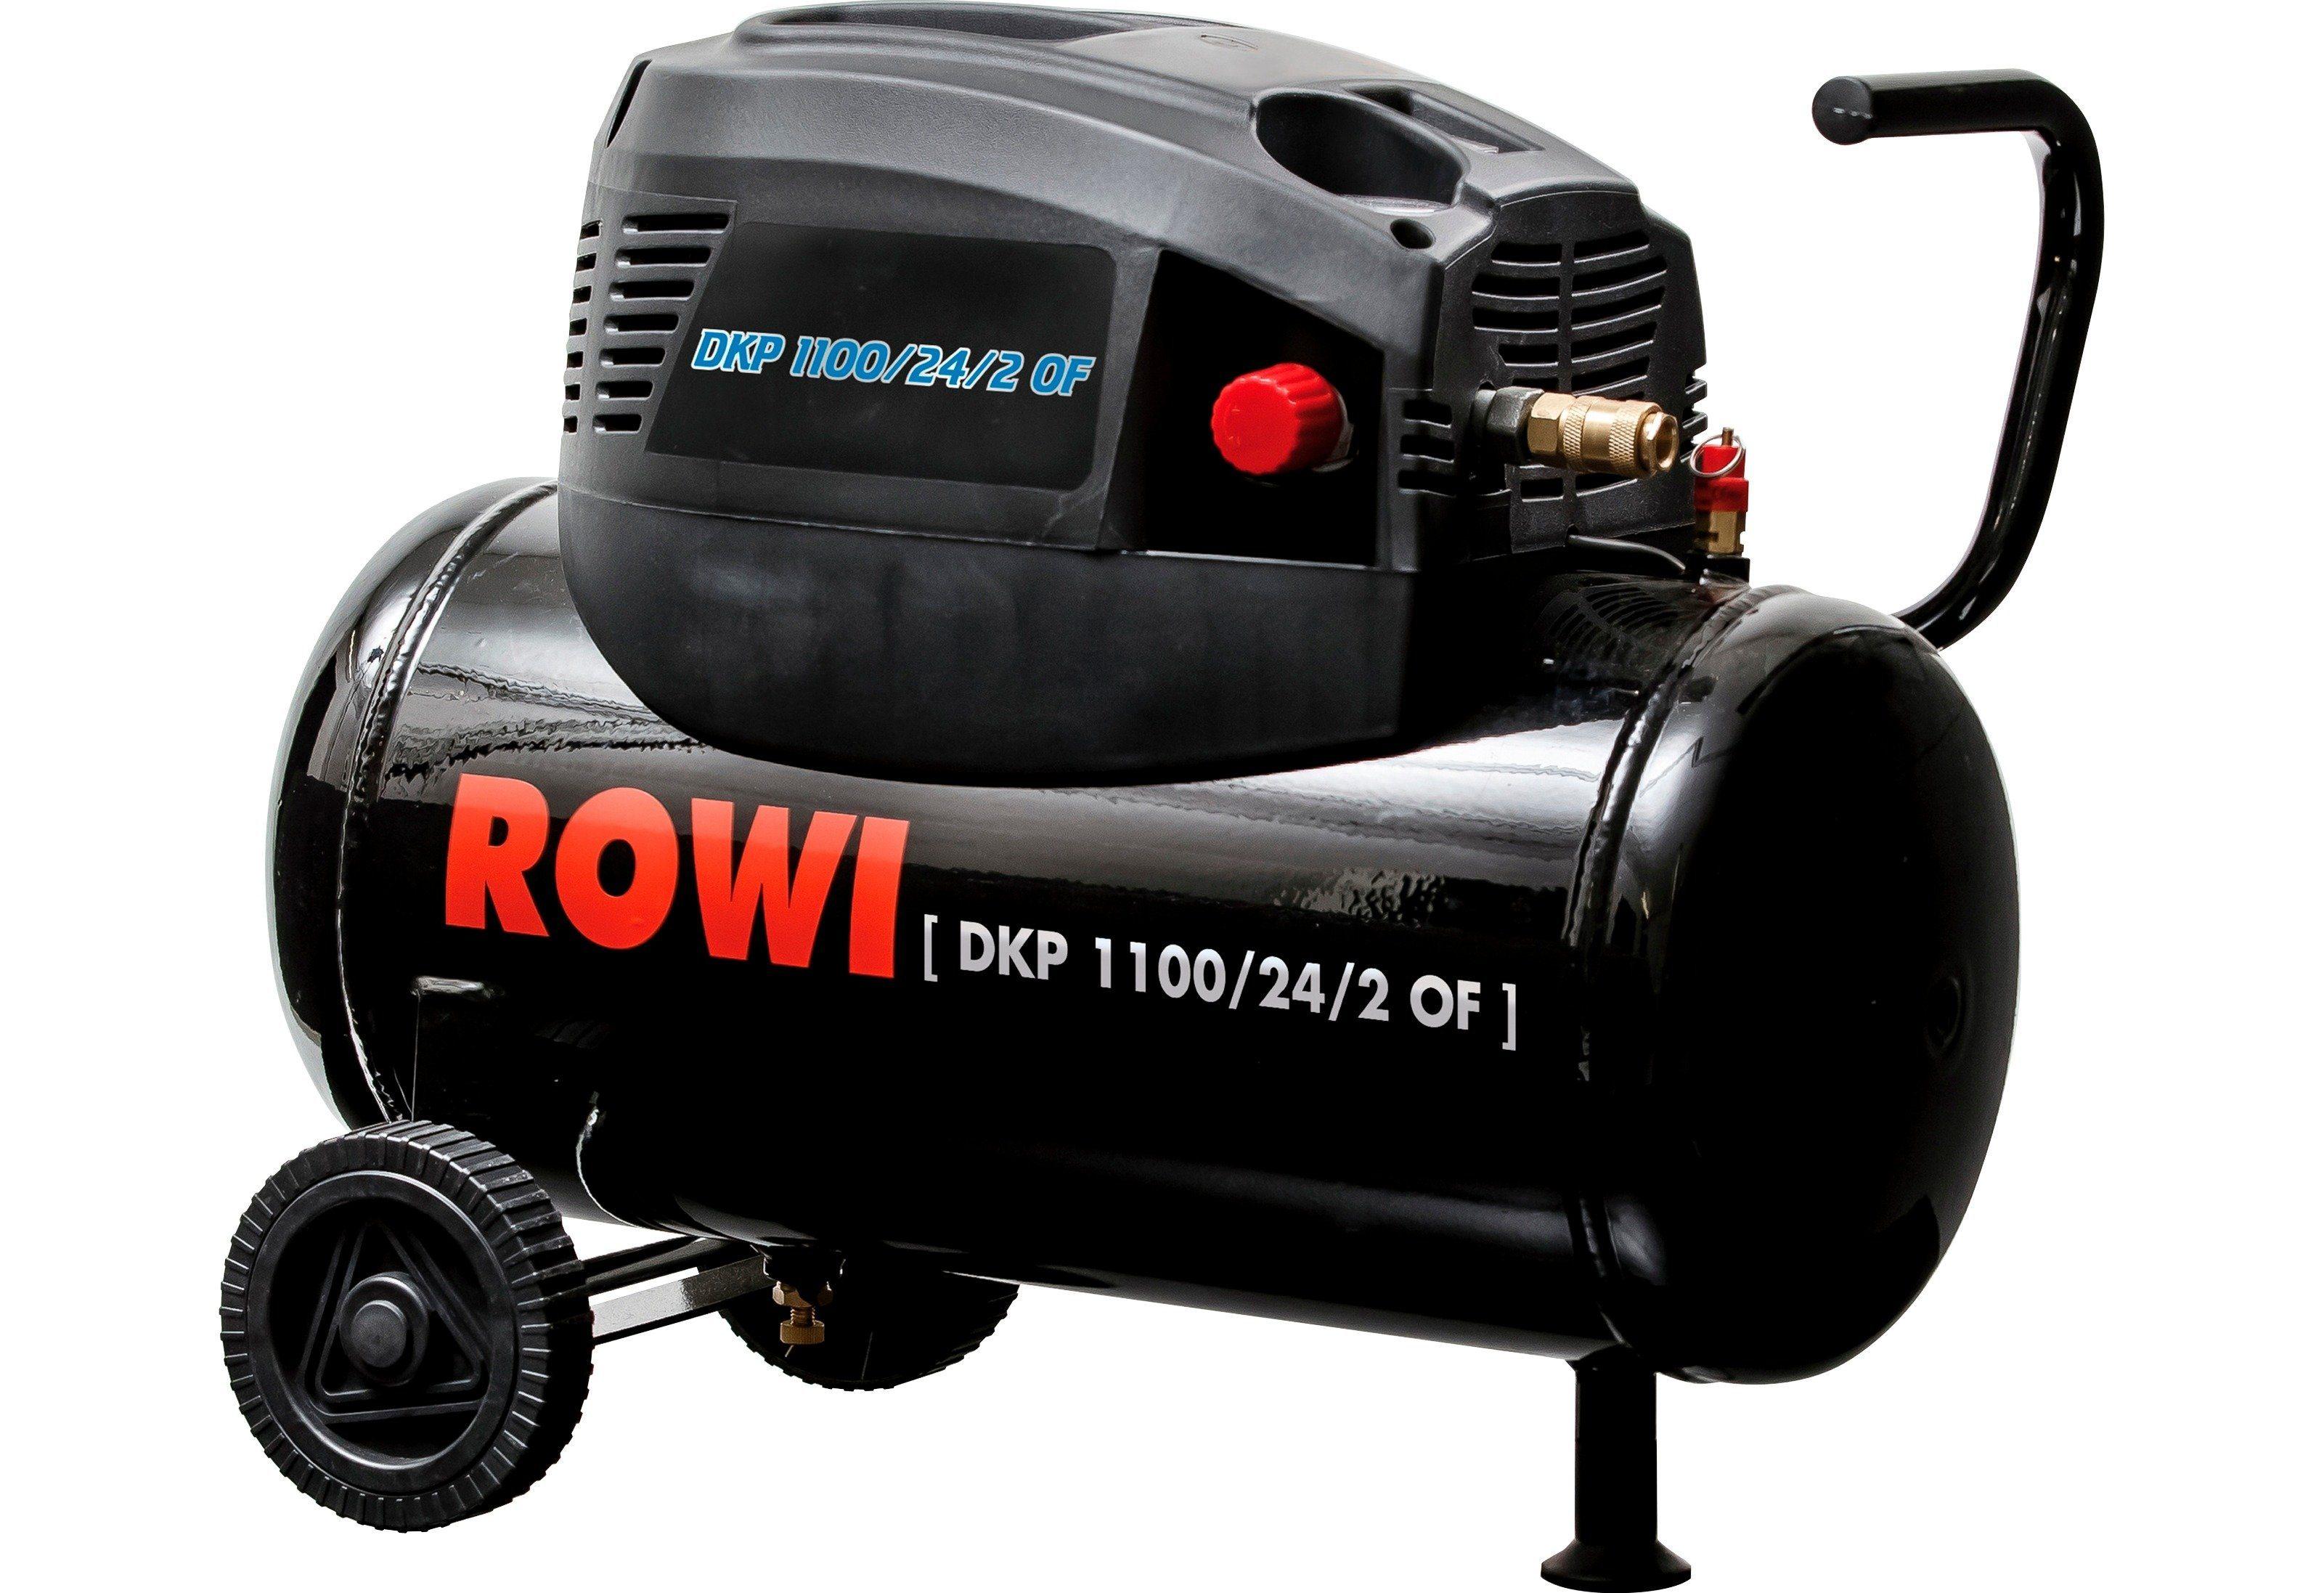 Rowi Kompressor »DKP 1100/24/2 OF«